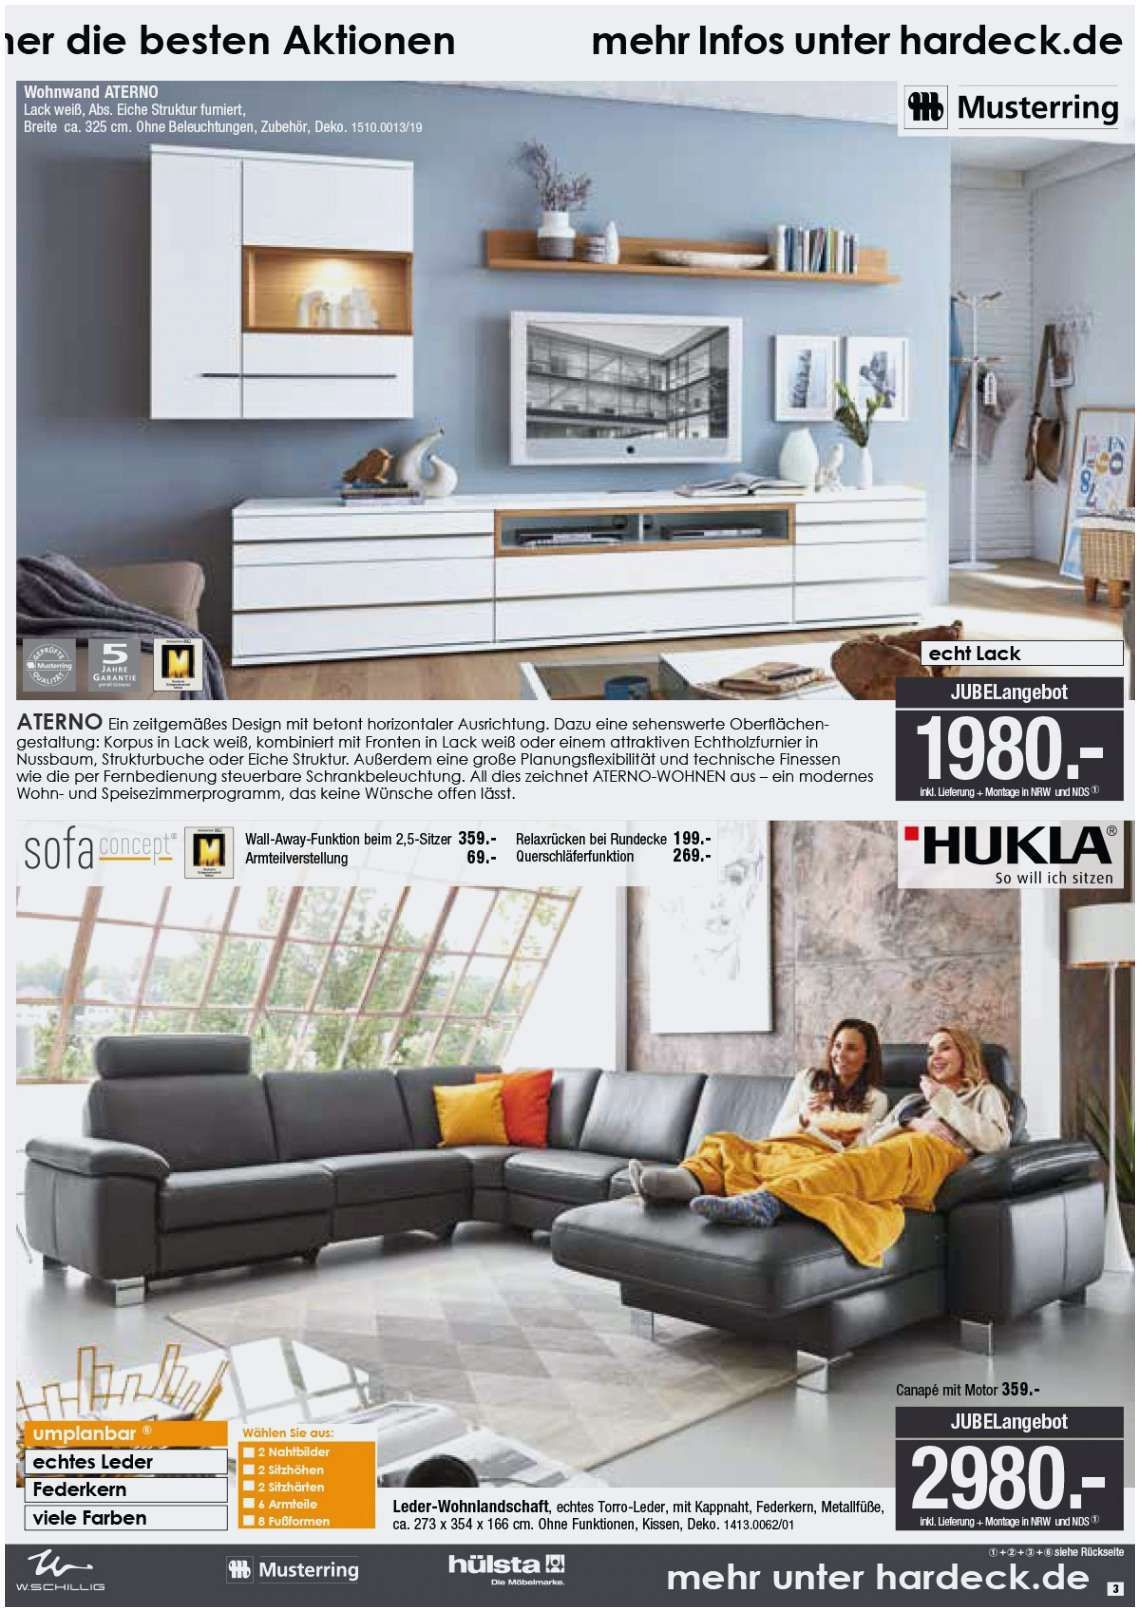 Hardi In Bochum Luxe Hubsch Mobel Hardi Bochum Pour Excellent Aterno Prix In 2020 Bedroom Design Inspiration Home Decor Bedroom Design